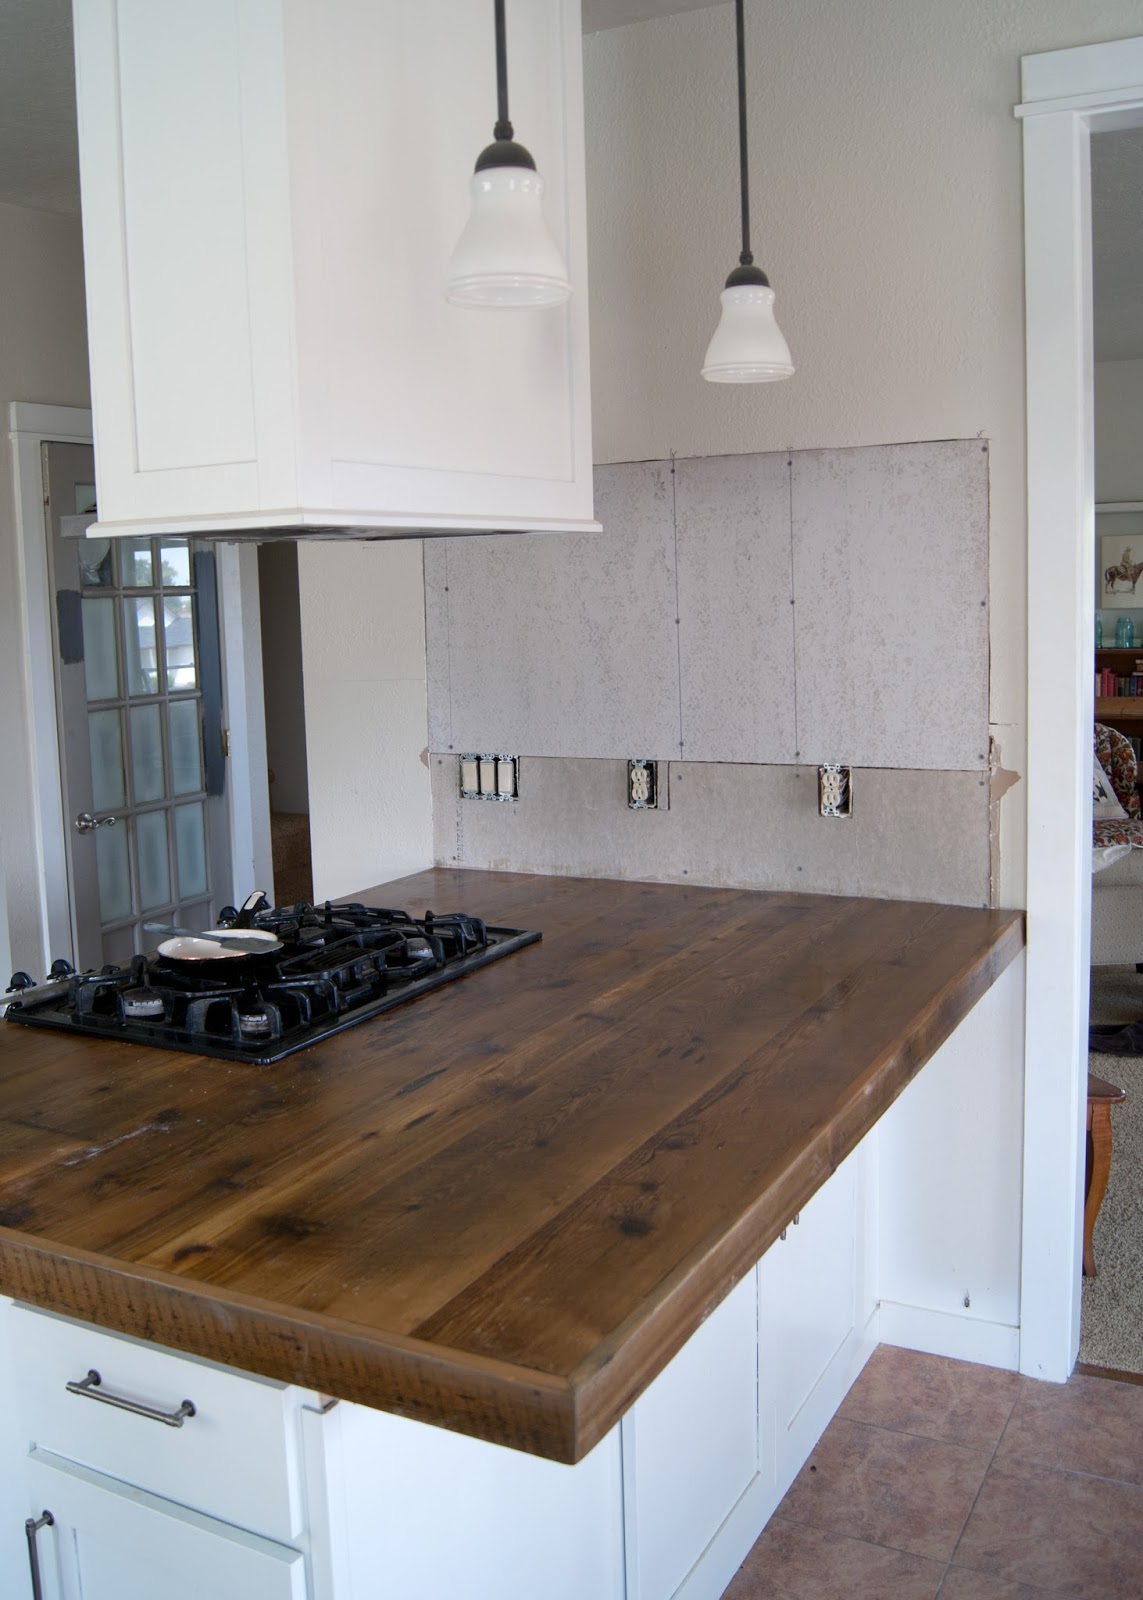 diy reclaimed wood countertop wood countertops kitchen DIY Reclaimed Wood Countertop afte